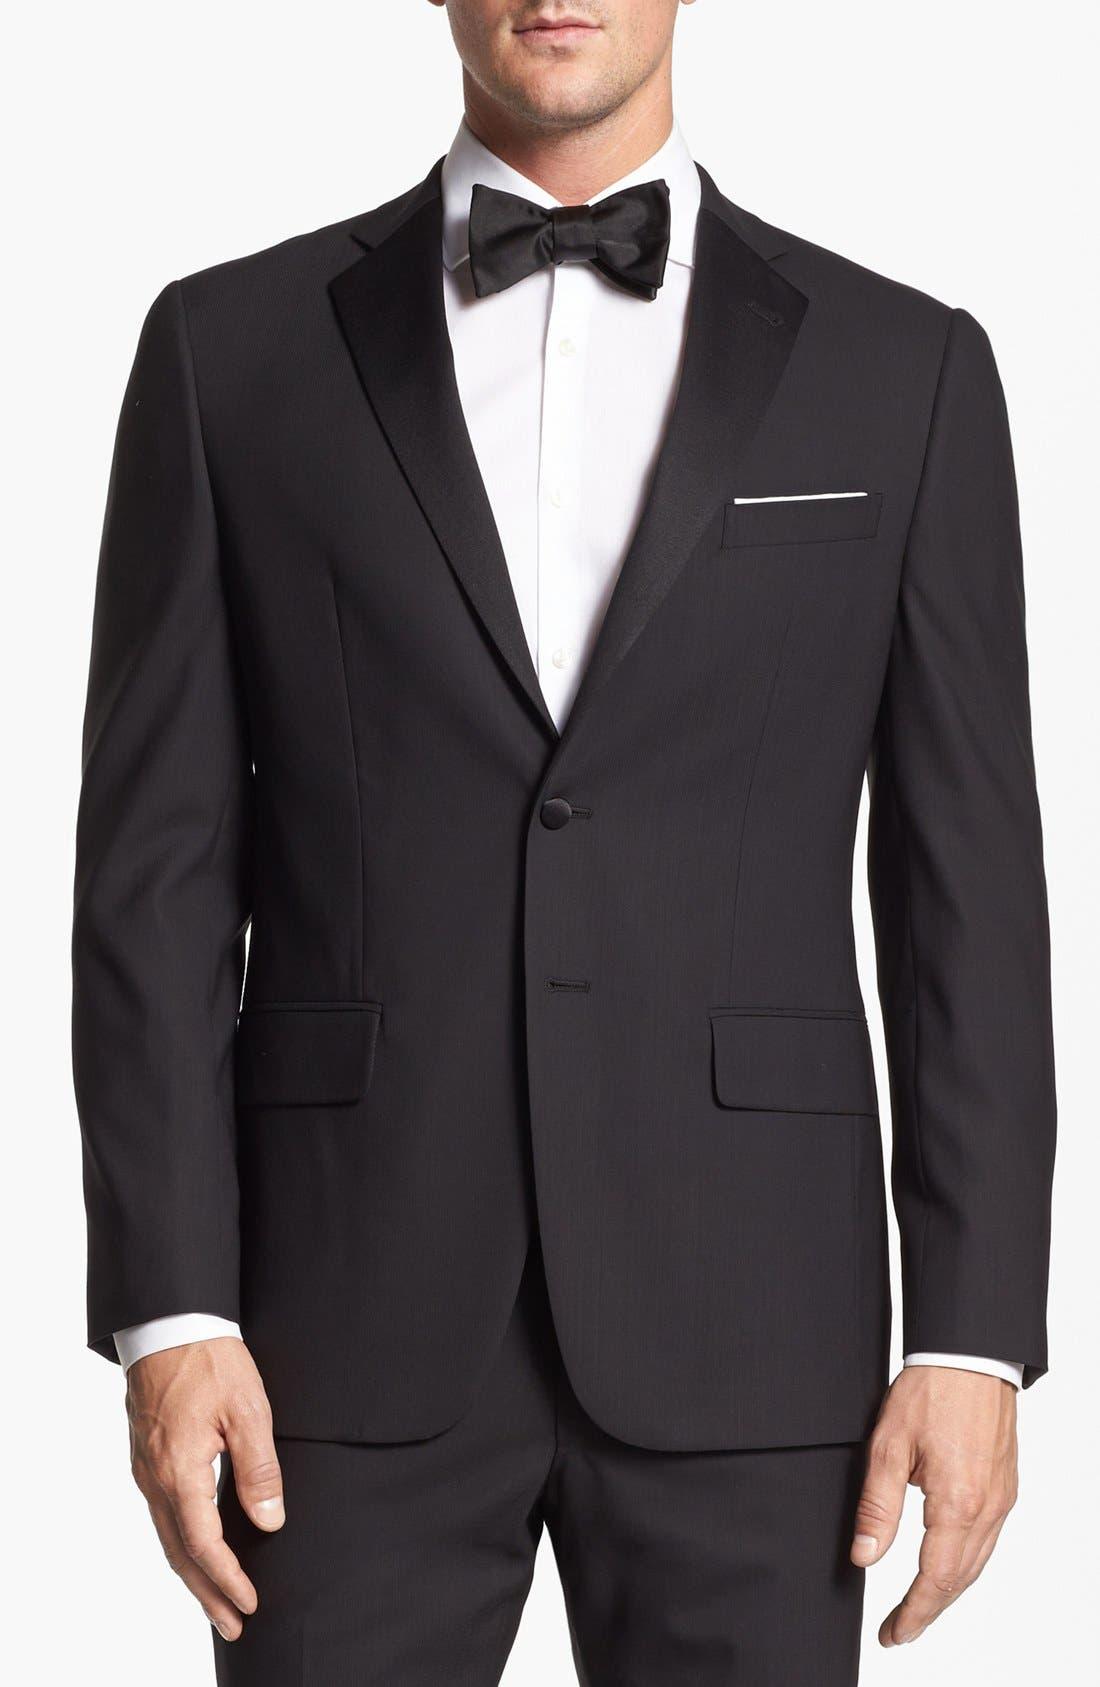 Alternate Image 4  - Joseph Abboud 'Profile Hybrid' Trim Fit Wool Tuxedo (Online Only)